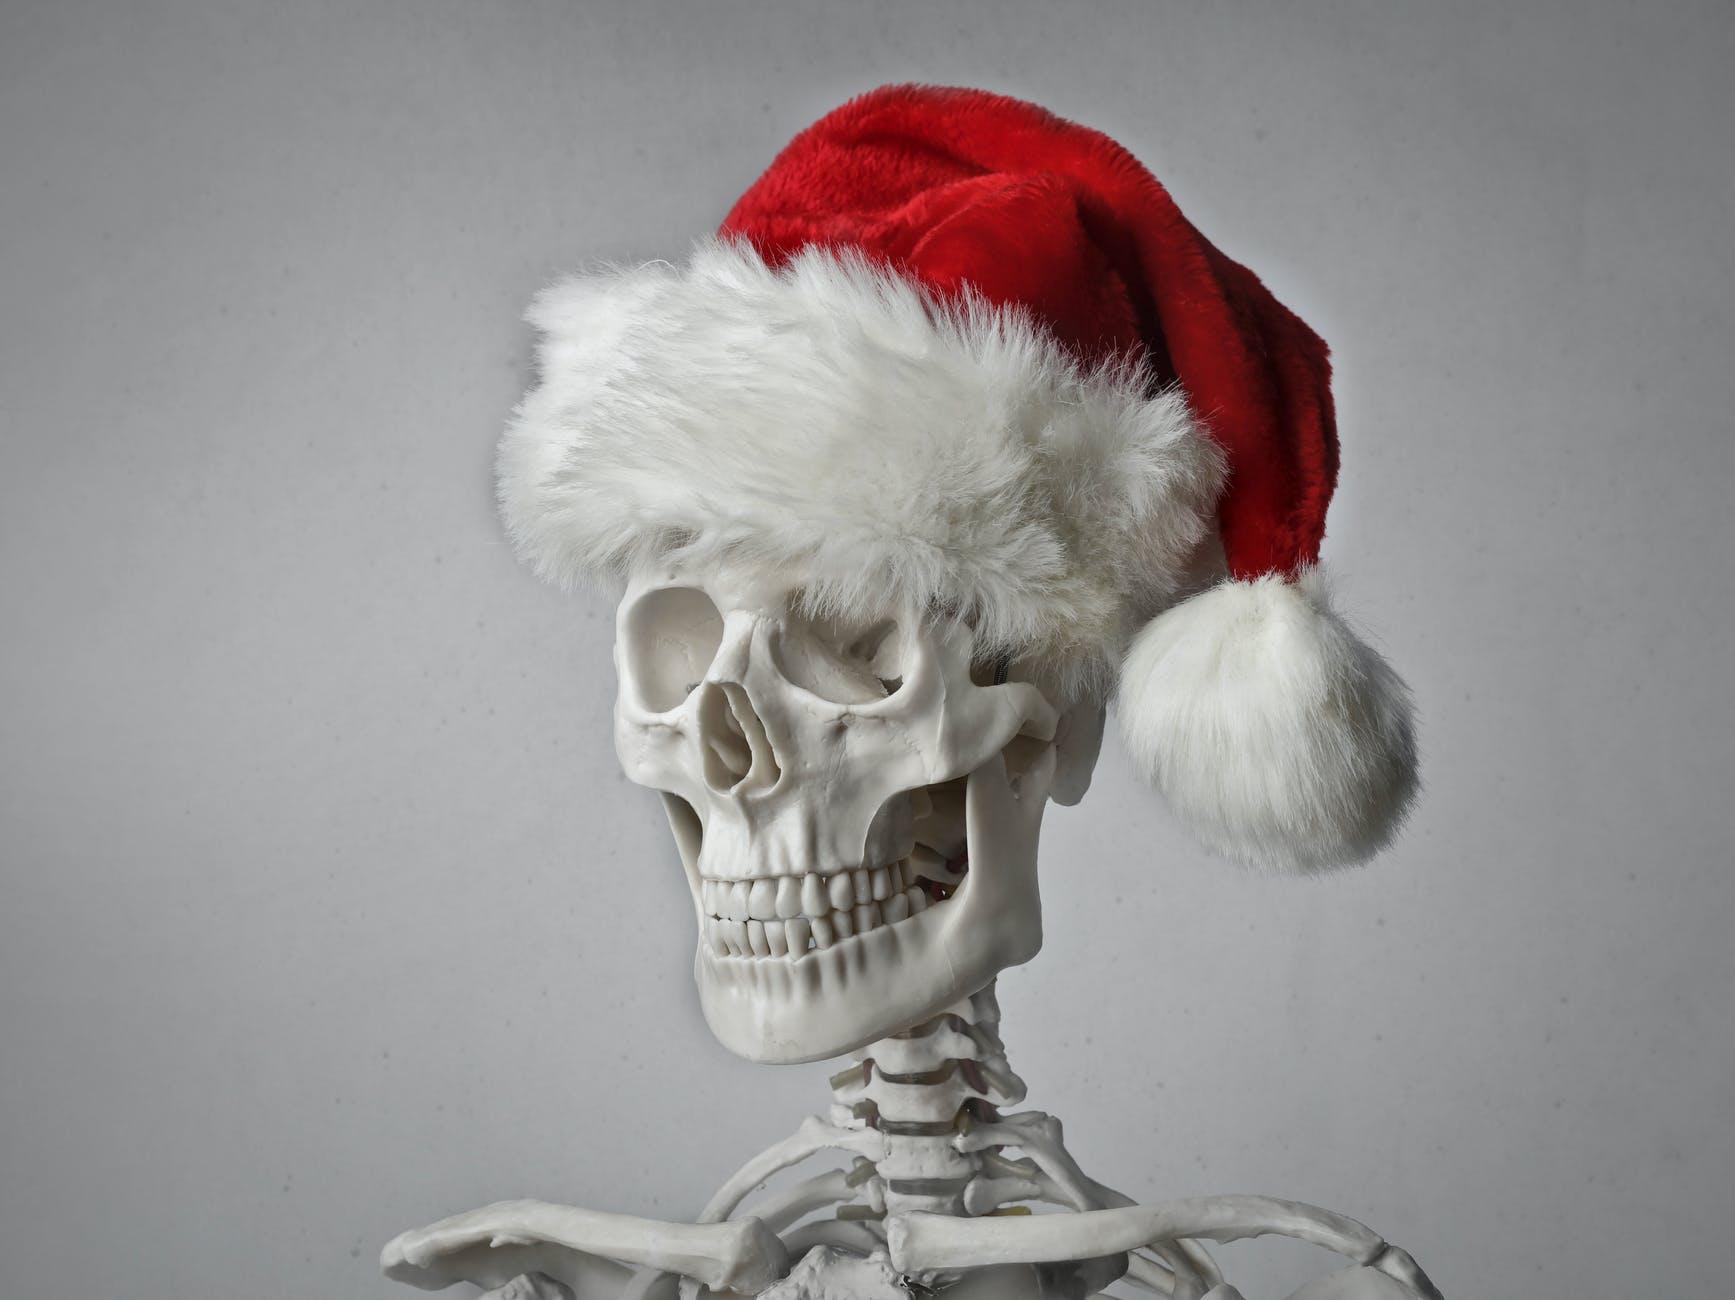 portrait photo of a skeleton in a santa hat on